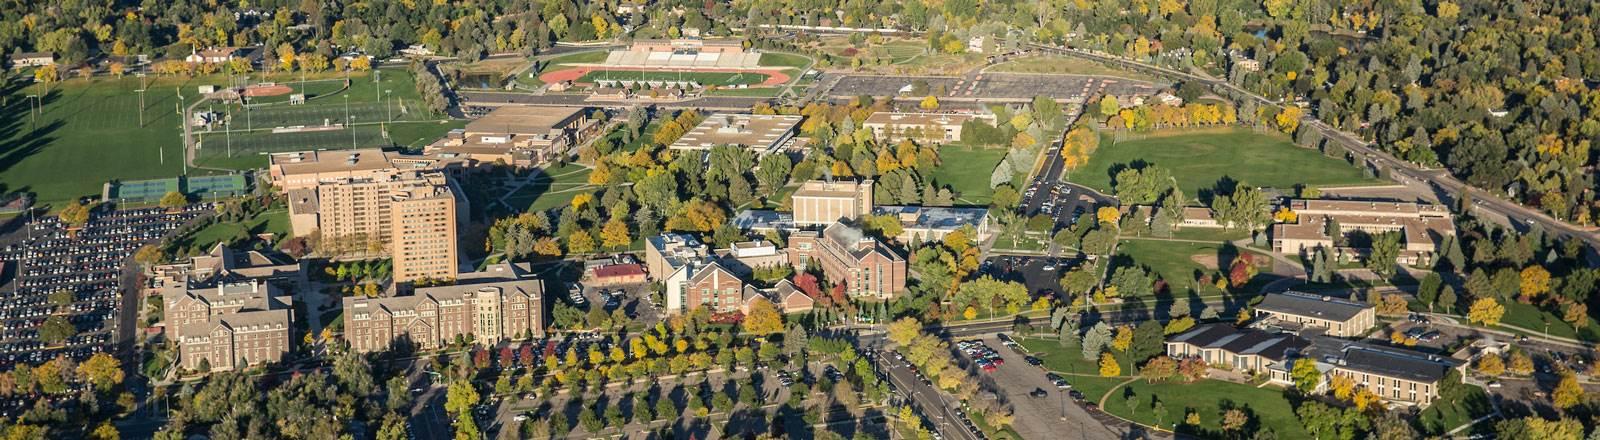 UNC aerial view